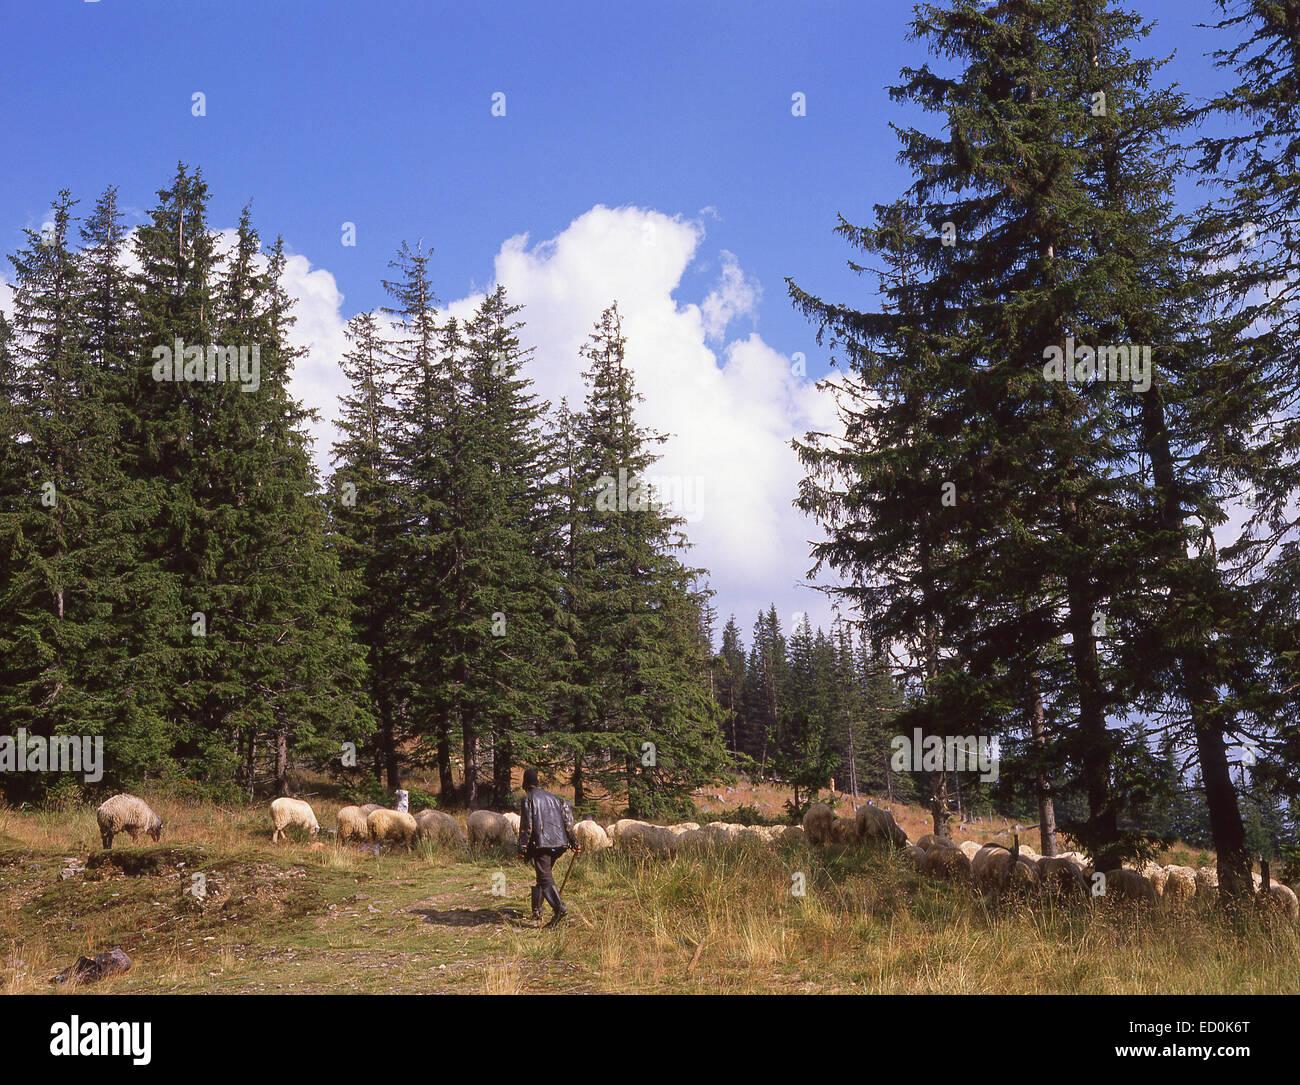 Shepherd herding sheep in field, Hargita County, Centru (Transylvania) Region, Romania - Stock Image